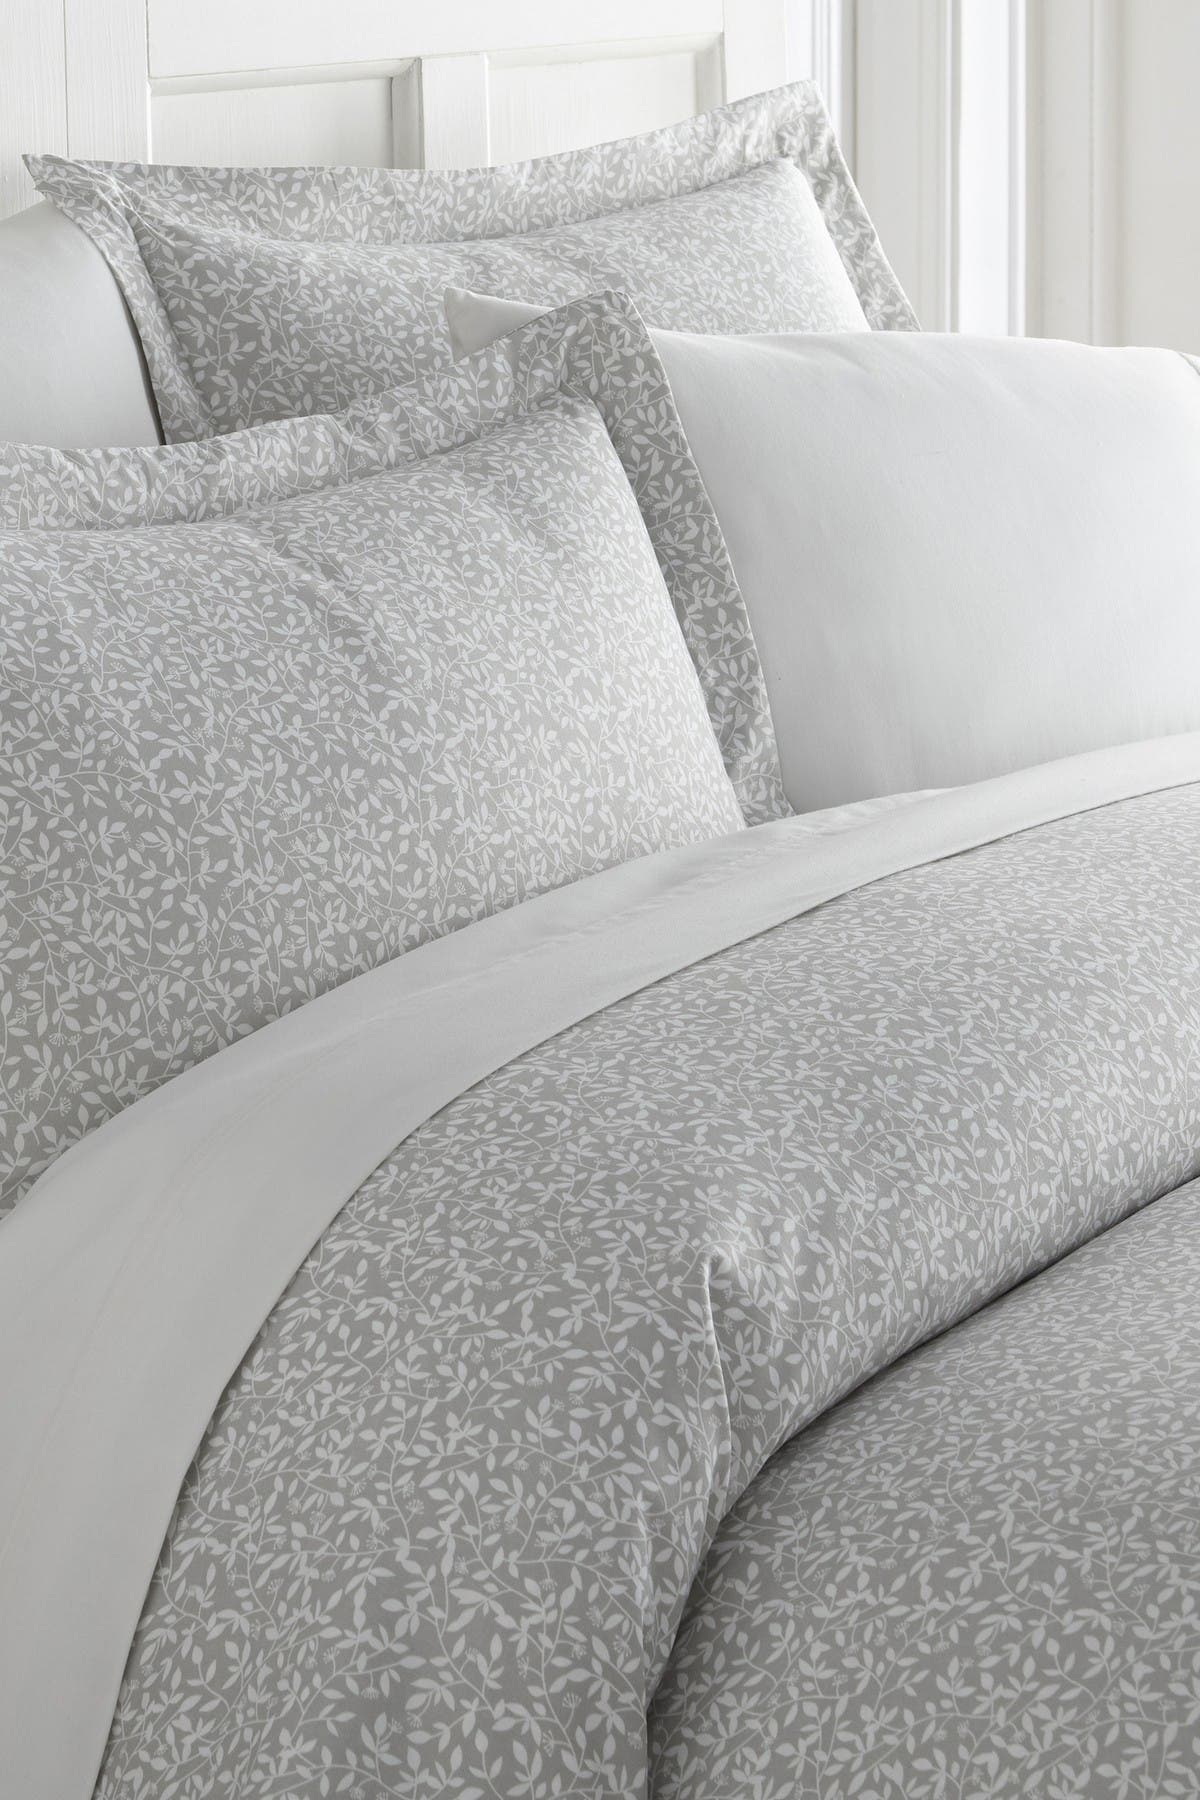 Image of IENJOY HOME Home Spun Premium Ultra Soft 2-Piece Vine Trellis Print Duvet Cover Twin Set - Gray